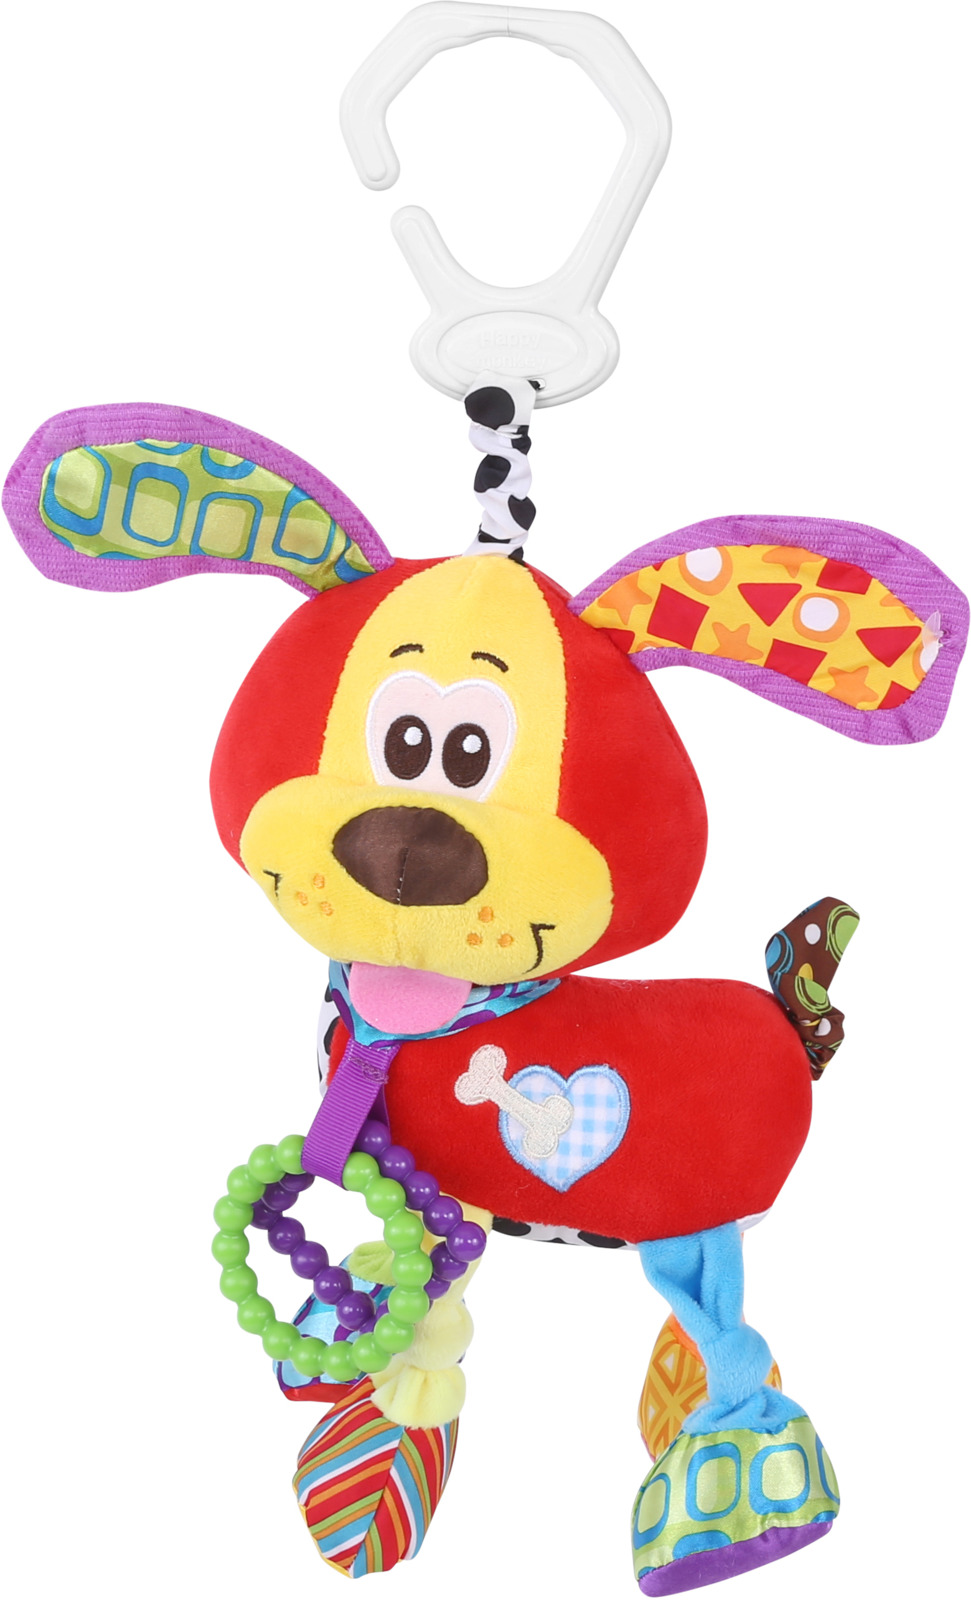 Развивающая игрушка Lorelli Toys Собачка. 1019114 развивающая игрушка lorelli toys обними меня мартышка 10191260001